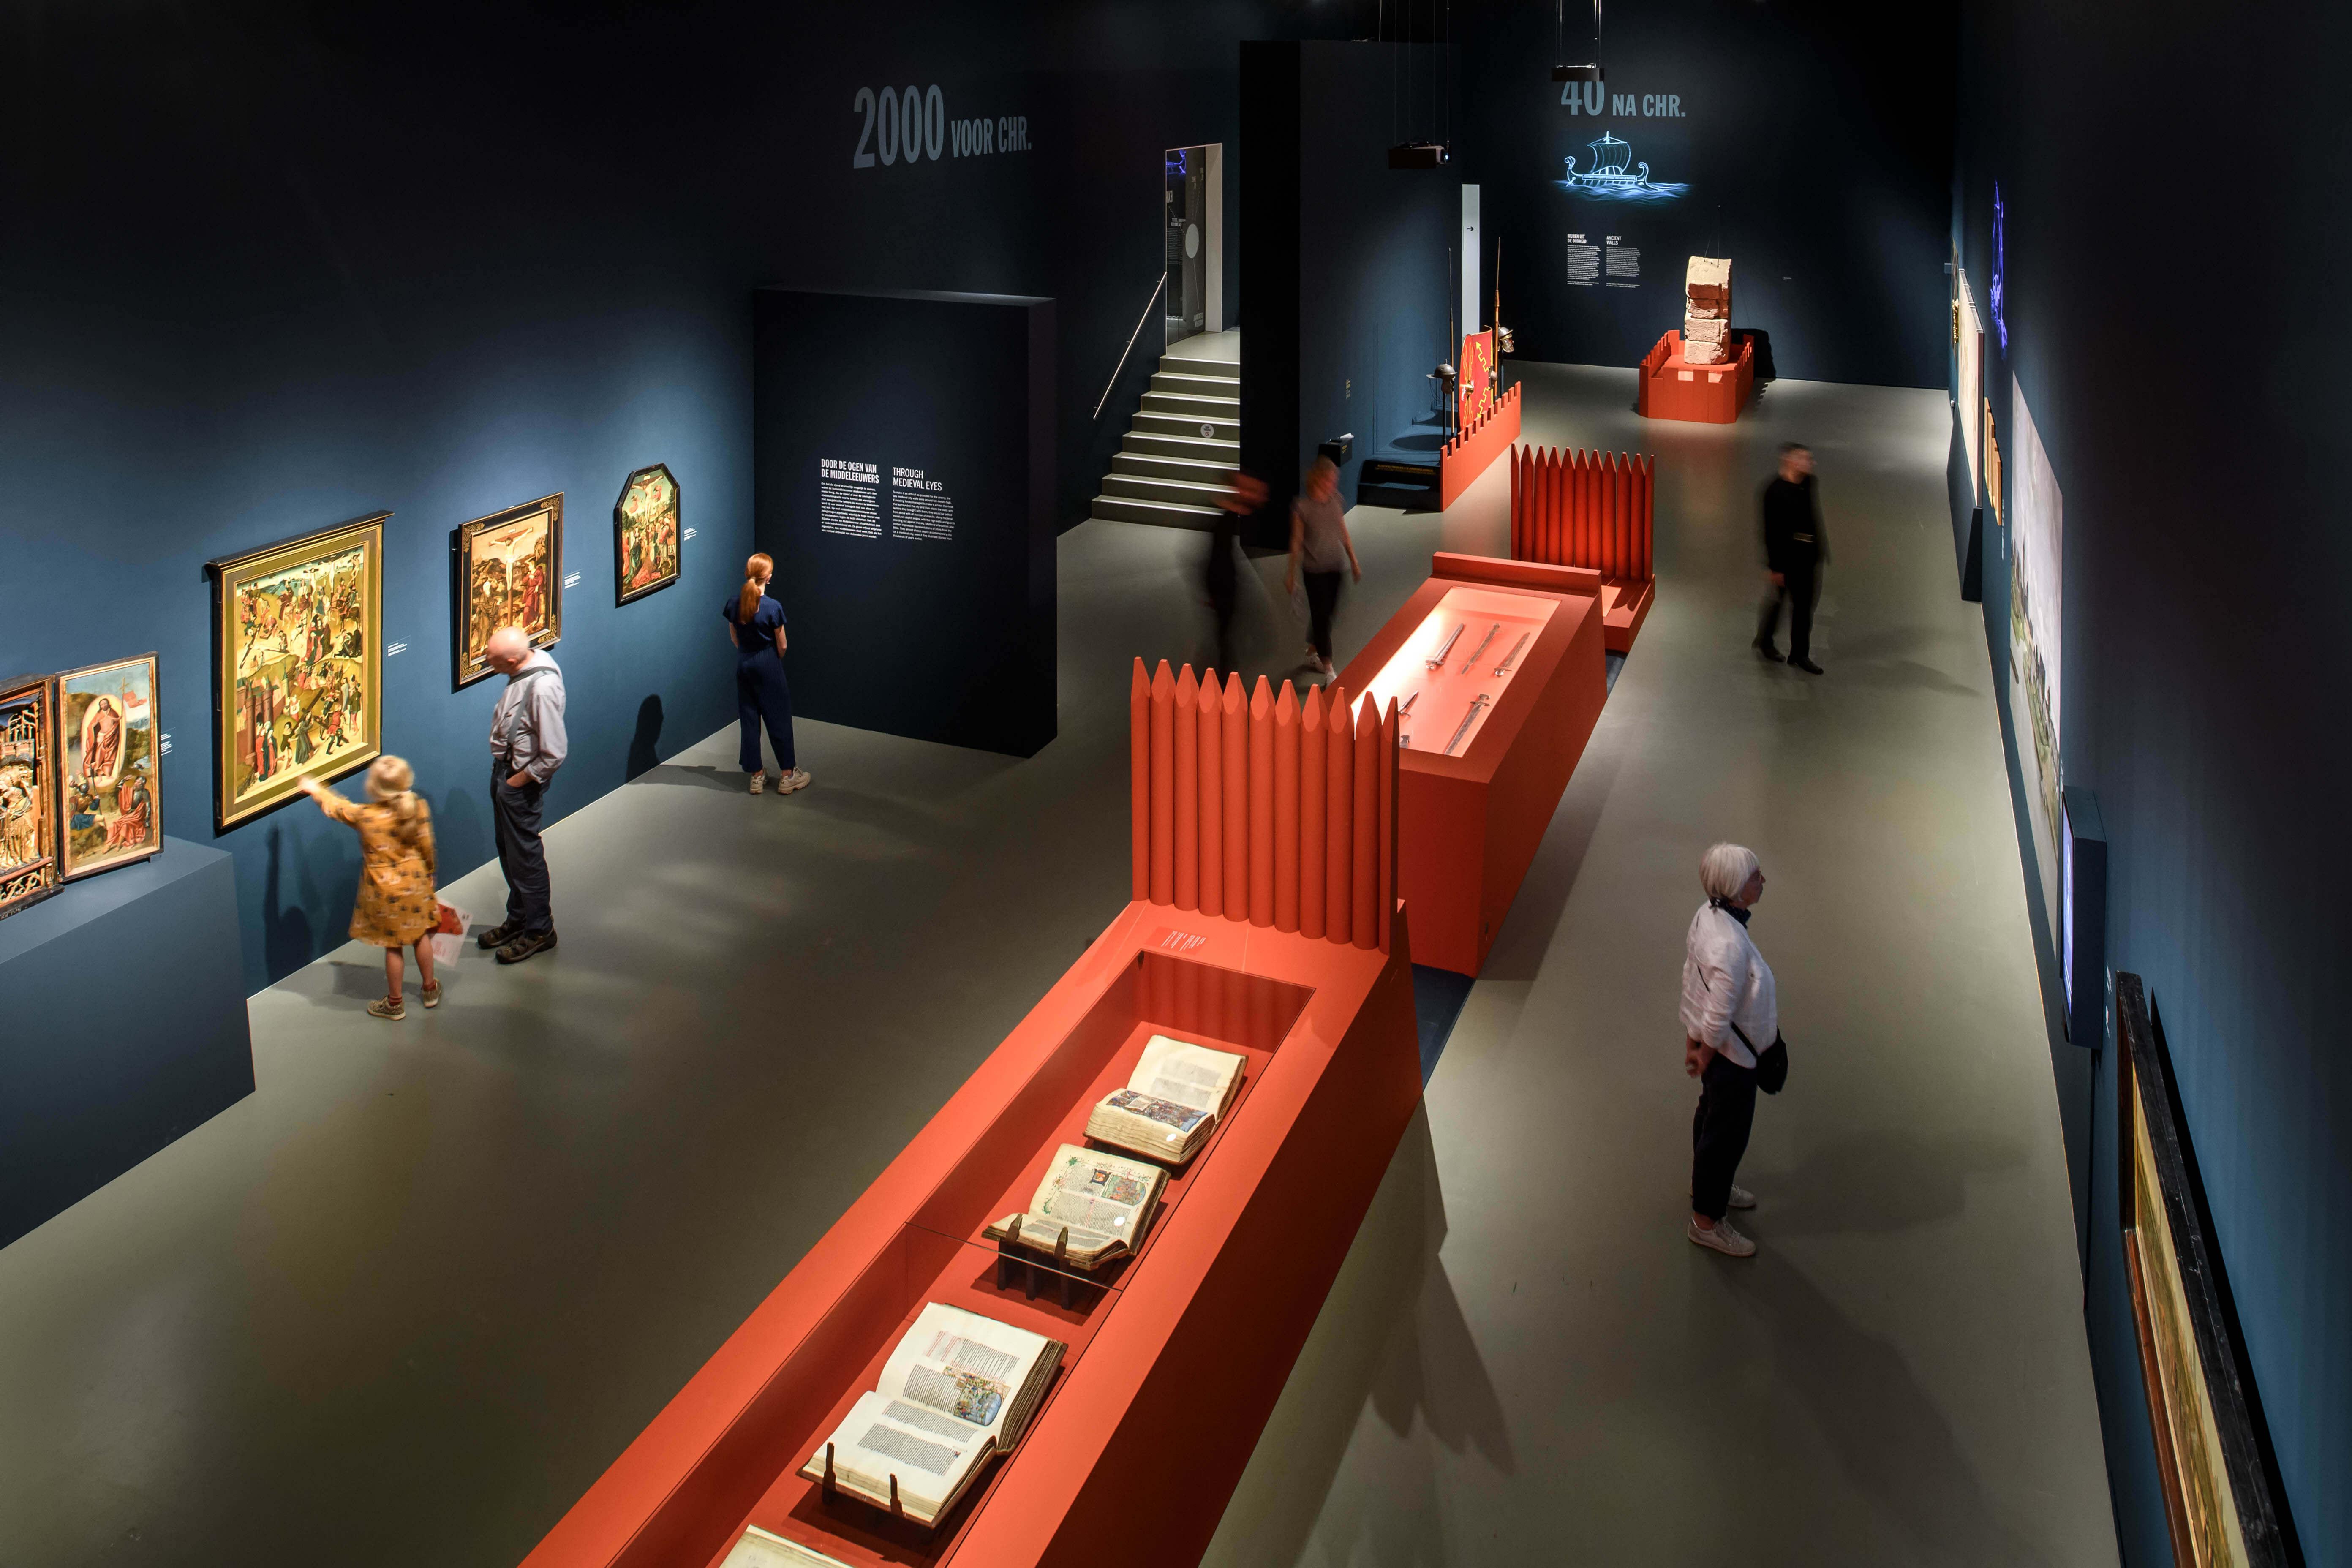 tentoonstelling de ommuurde stad centraal museum 1 6 jpg